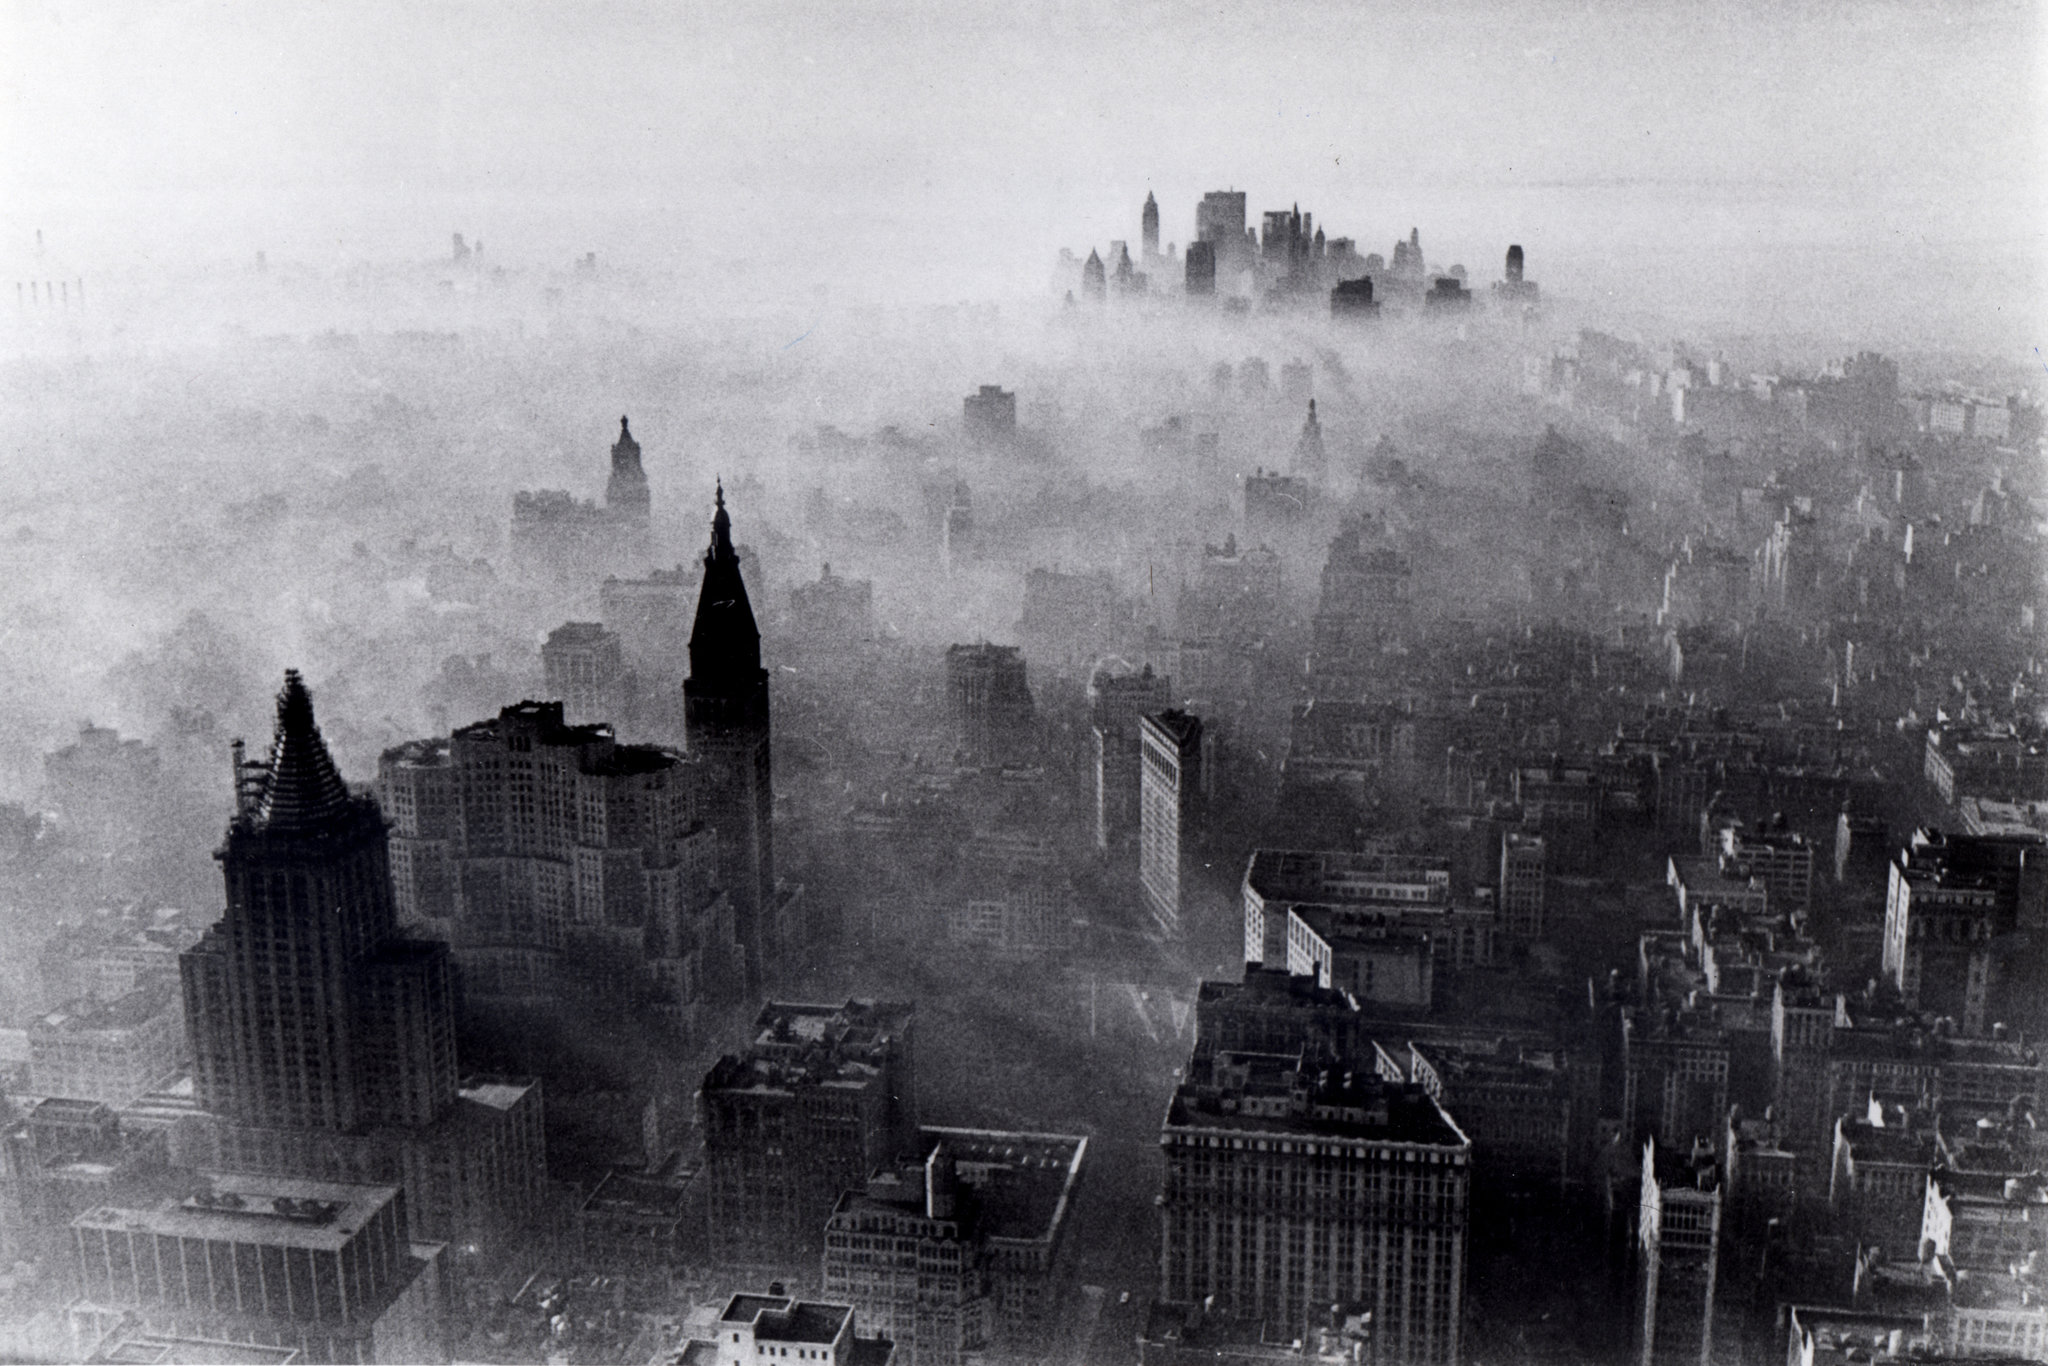 Empire State Building on Nov. 24, 1966, one of New York's worst smog days. Neal Boenzi. Fair Use.